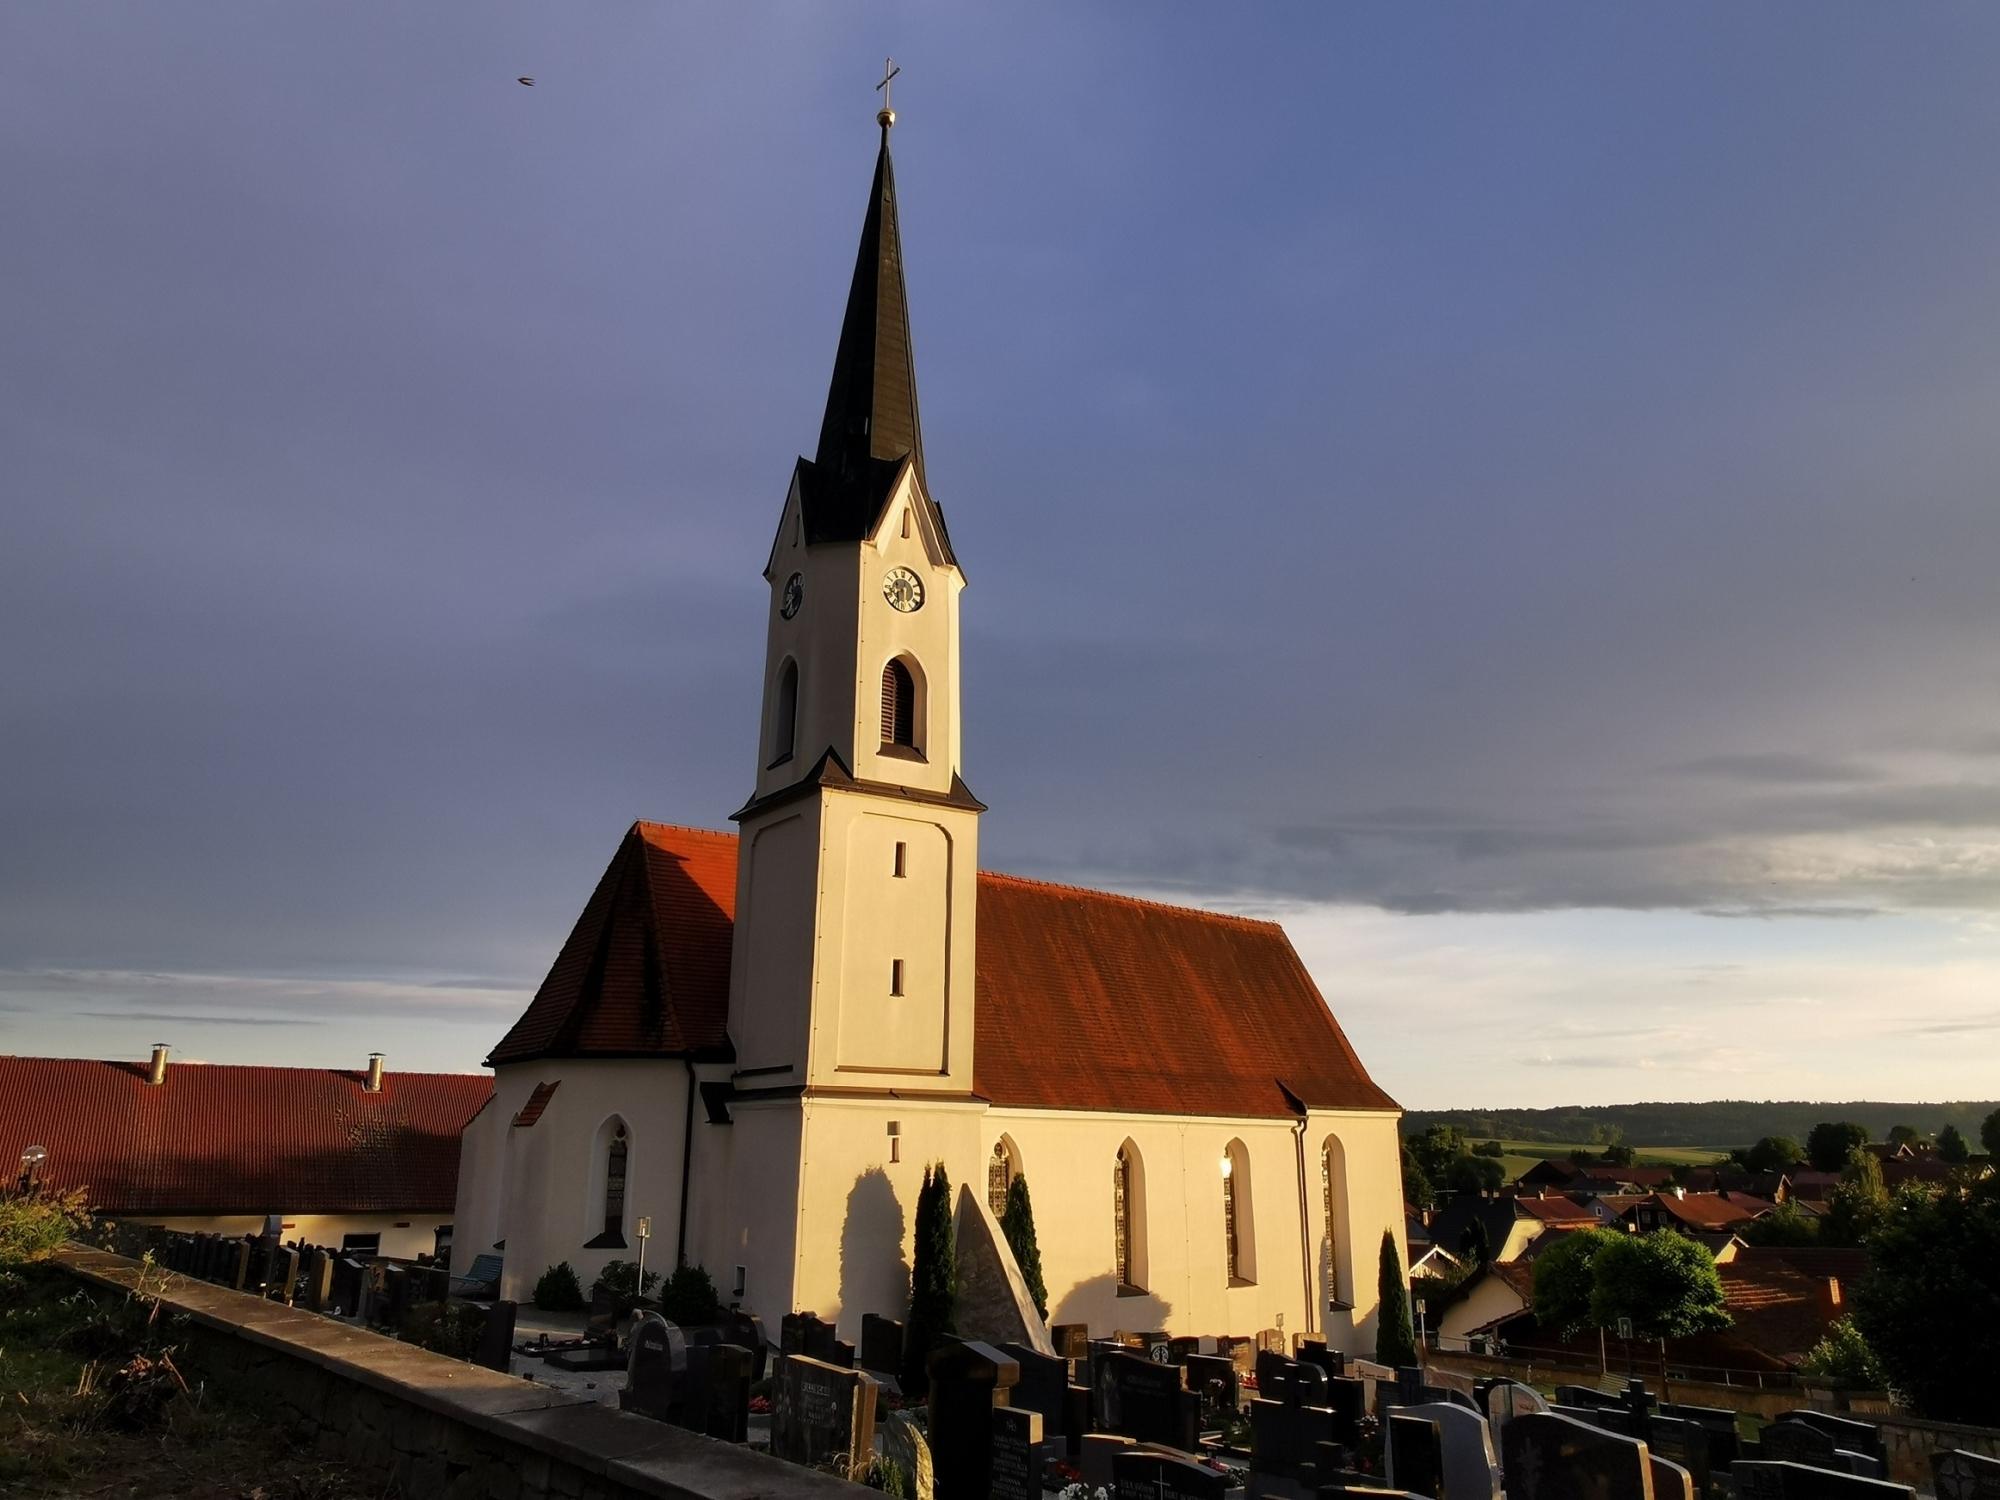 Haarbach 2